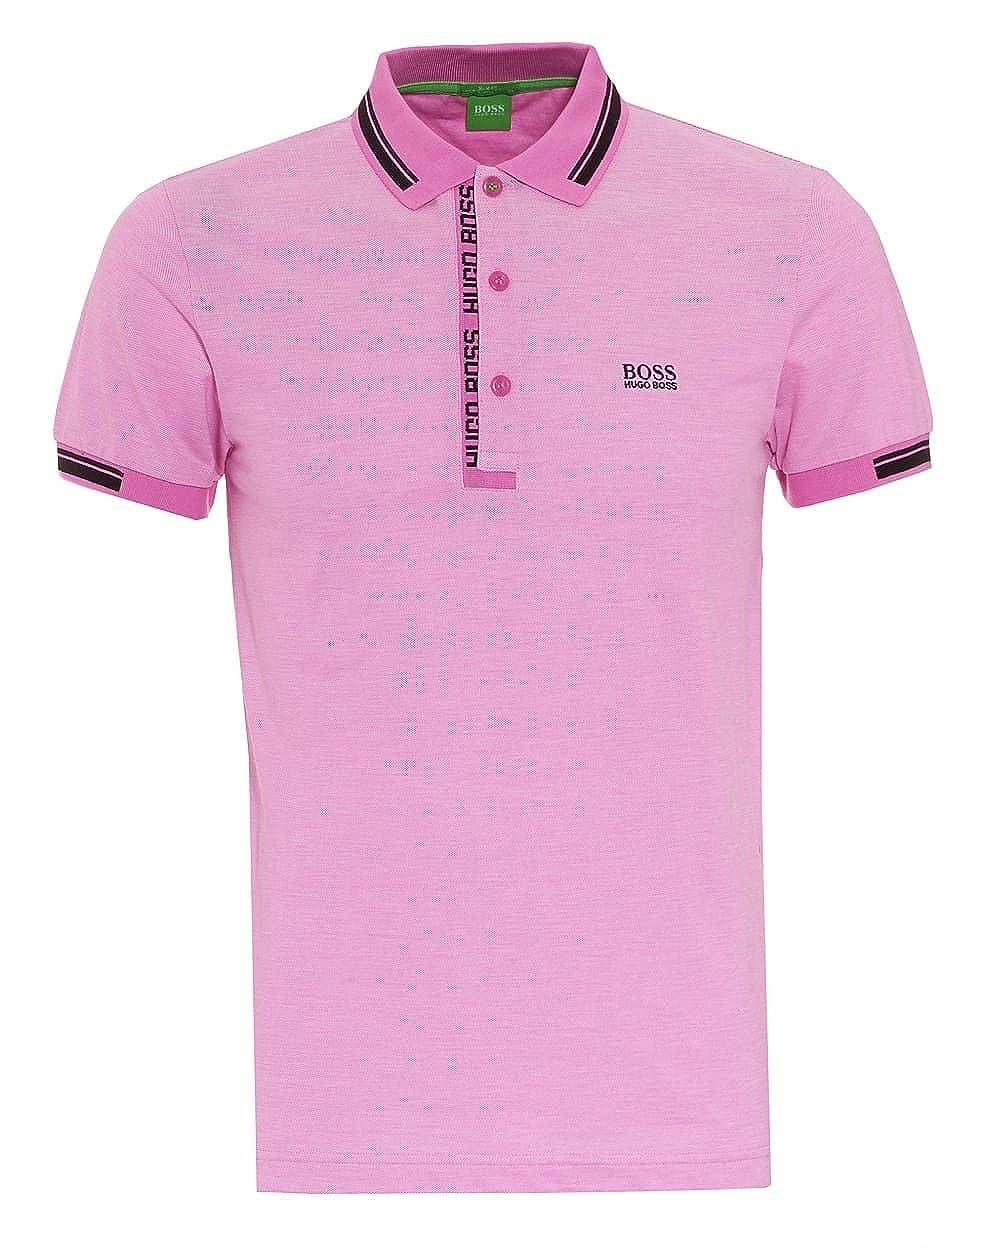 a38ba3186 BOSS Hugo Green Mens Paule 4 Polo, Oxford Pique Open Purple Pink Polo  Shirt: Amazon.co.uk: Clothing